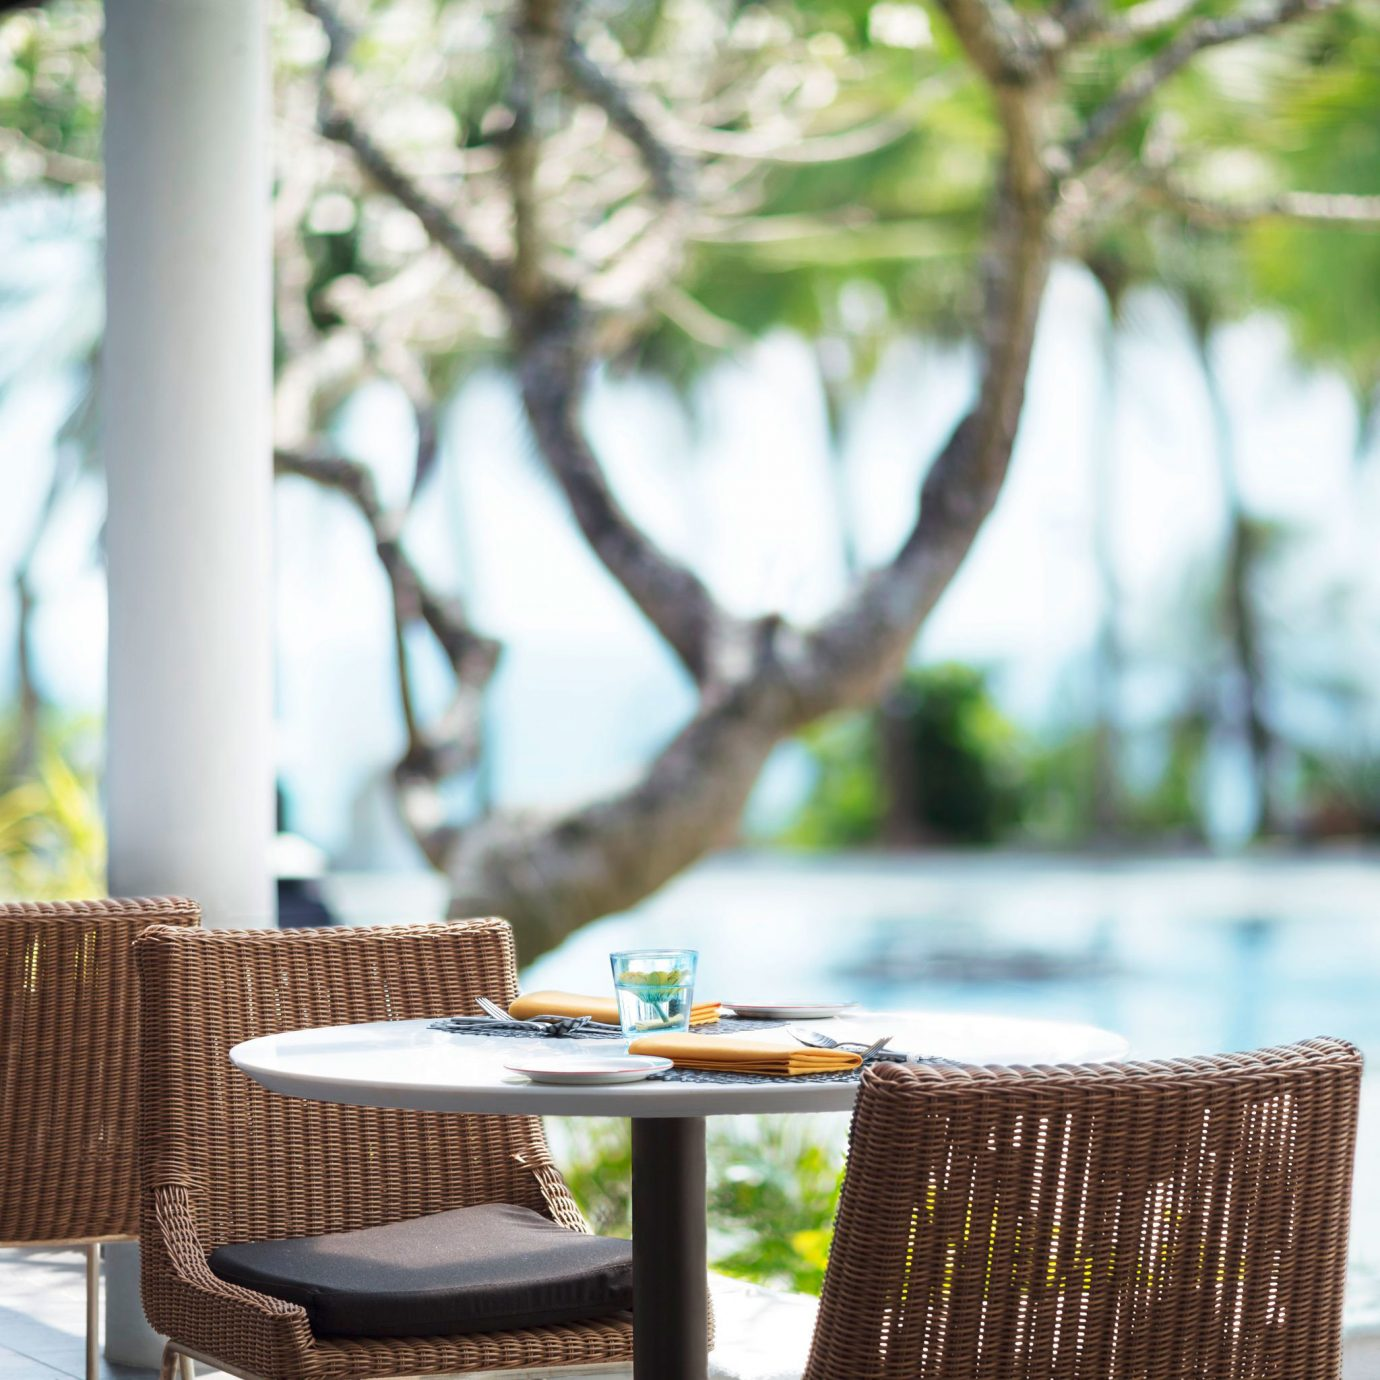 Dining Drink Eat Pool Resort tree chair park backyard flower dining table